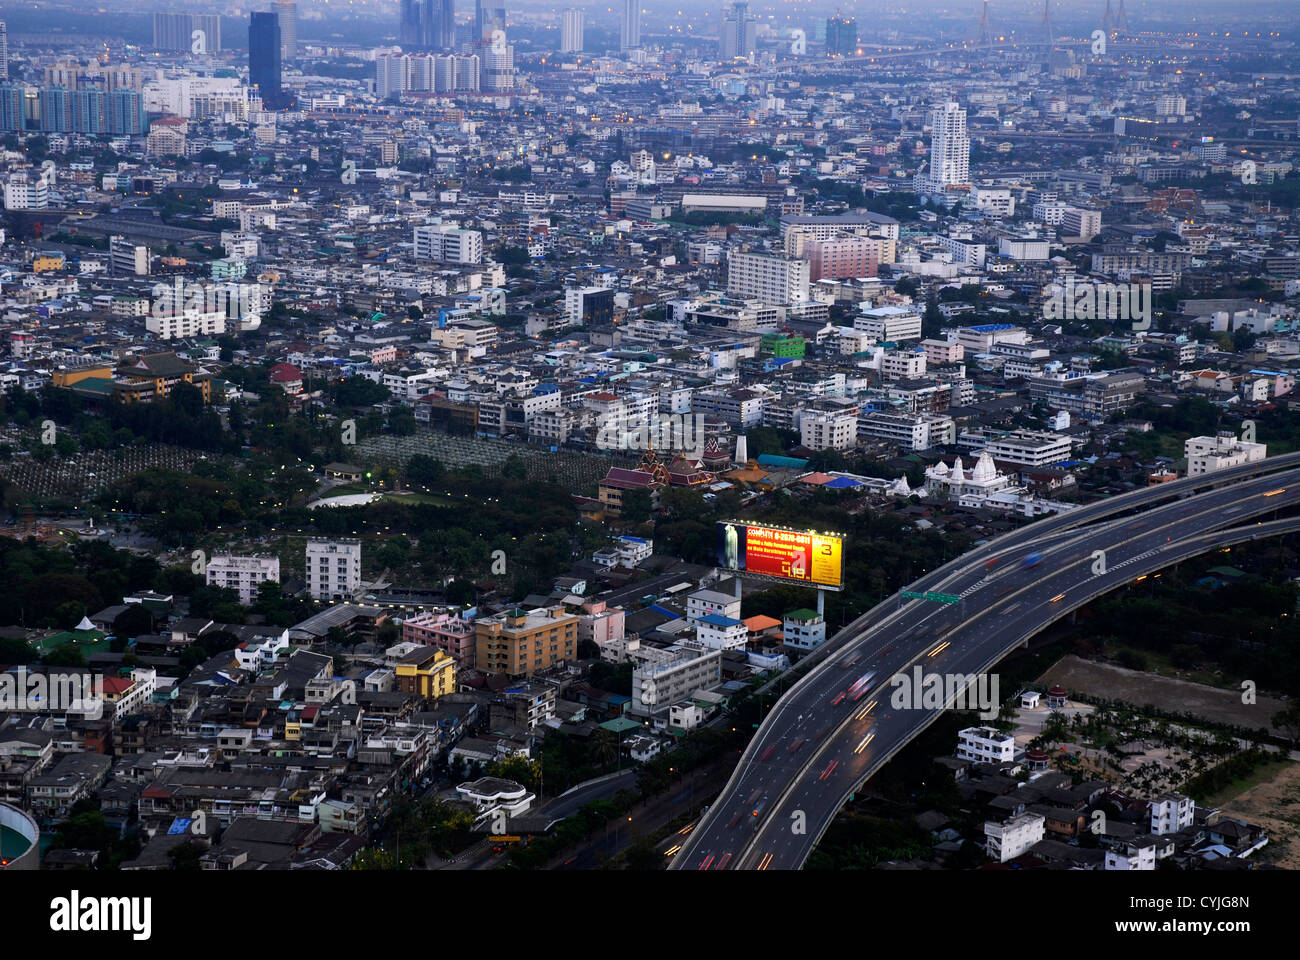 View, Panoramic, Nightlife, Bangkok, Dome,  Sirocco, Sky Bar, Sight, Thailand, Asia - Stock Image